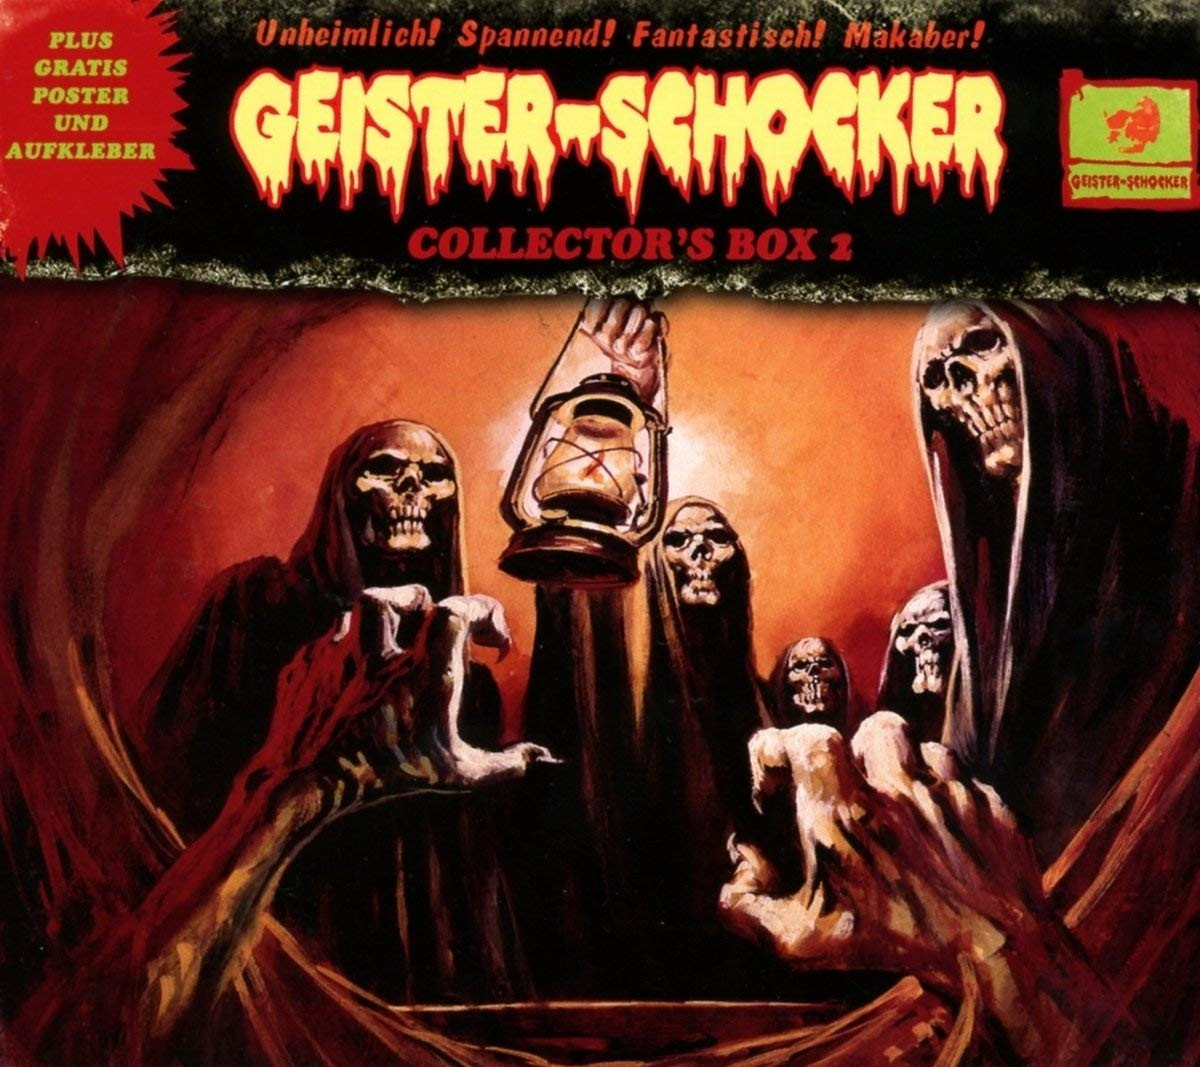 Geister-Schocker Collector's Box 2 (Folge 2-4)